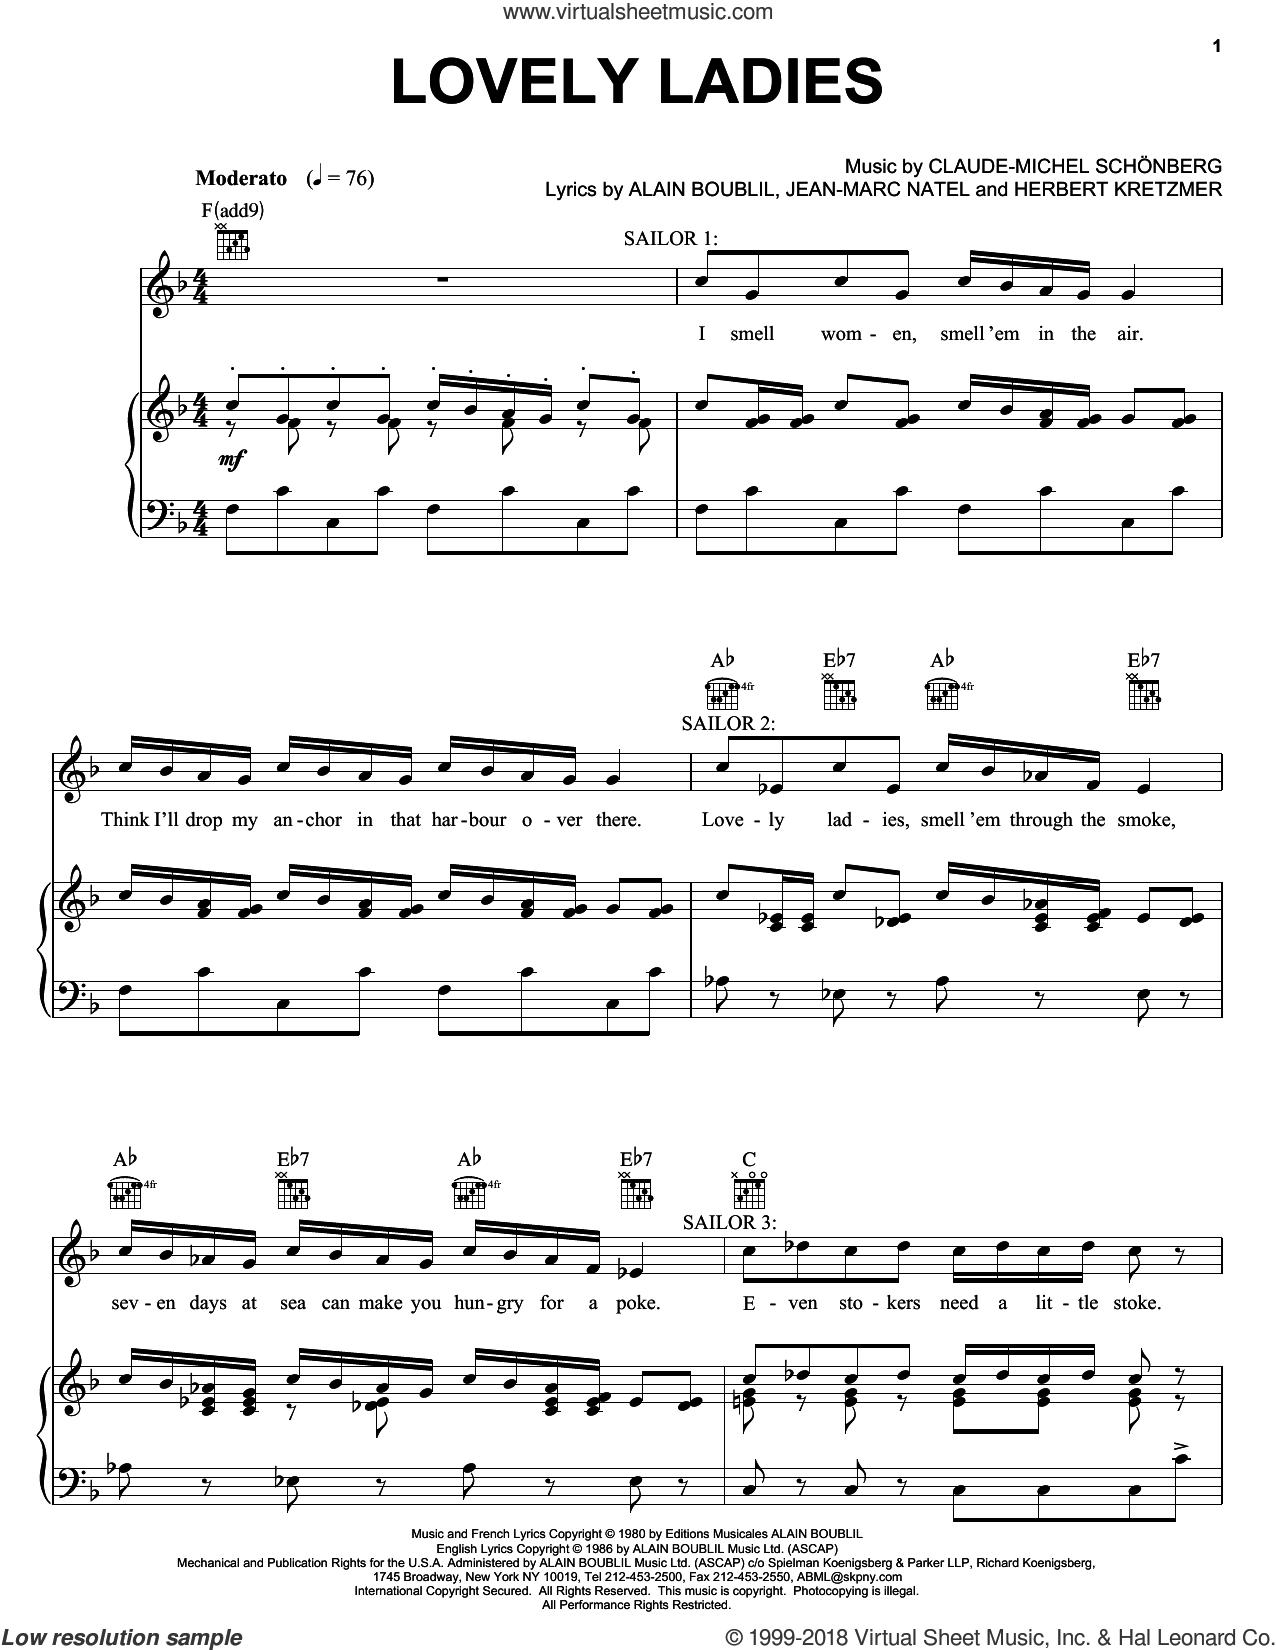 Lovely Ladies sheet music for voice, piano or guitar by Alain Boublil, Les Miserables (Musical), Herbert Kretzmer and Jean-Marc Natel, intermediate skill level